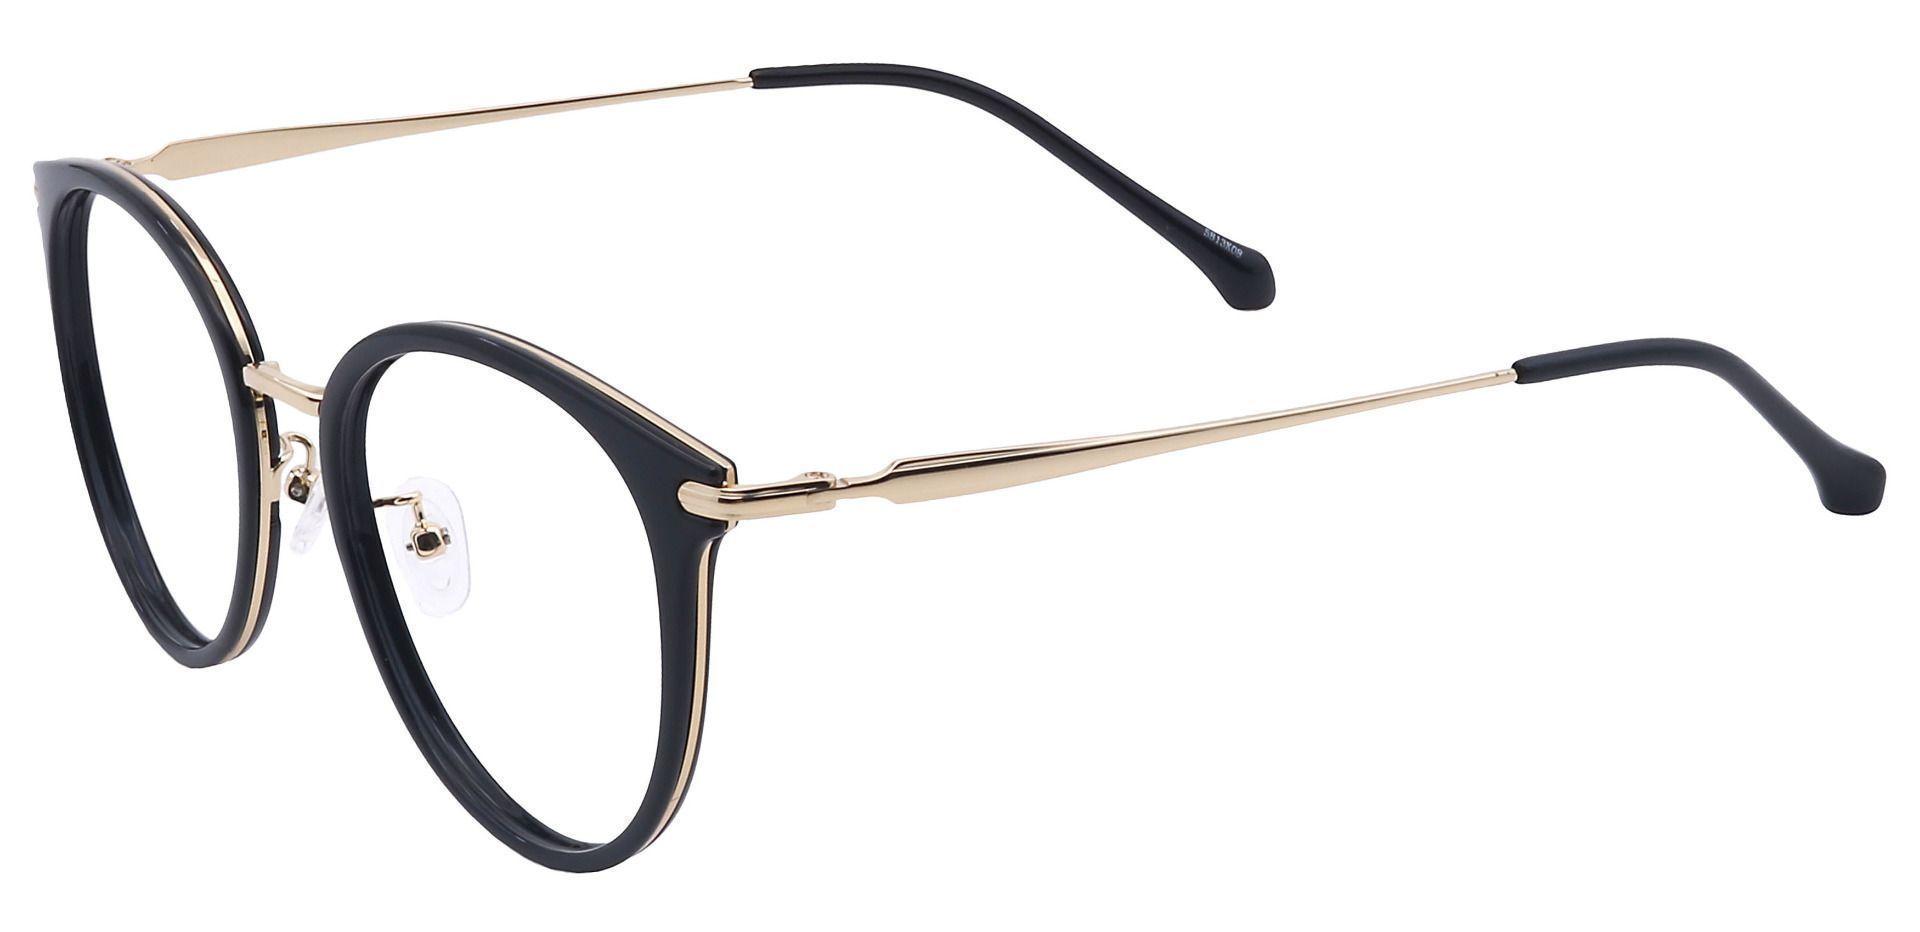 Midas Round Reading Glasses - Black